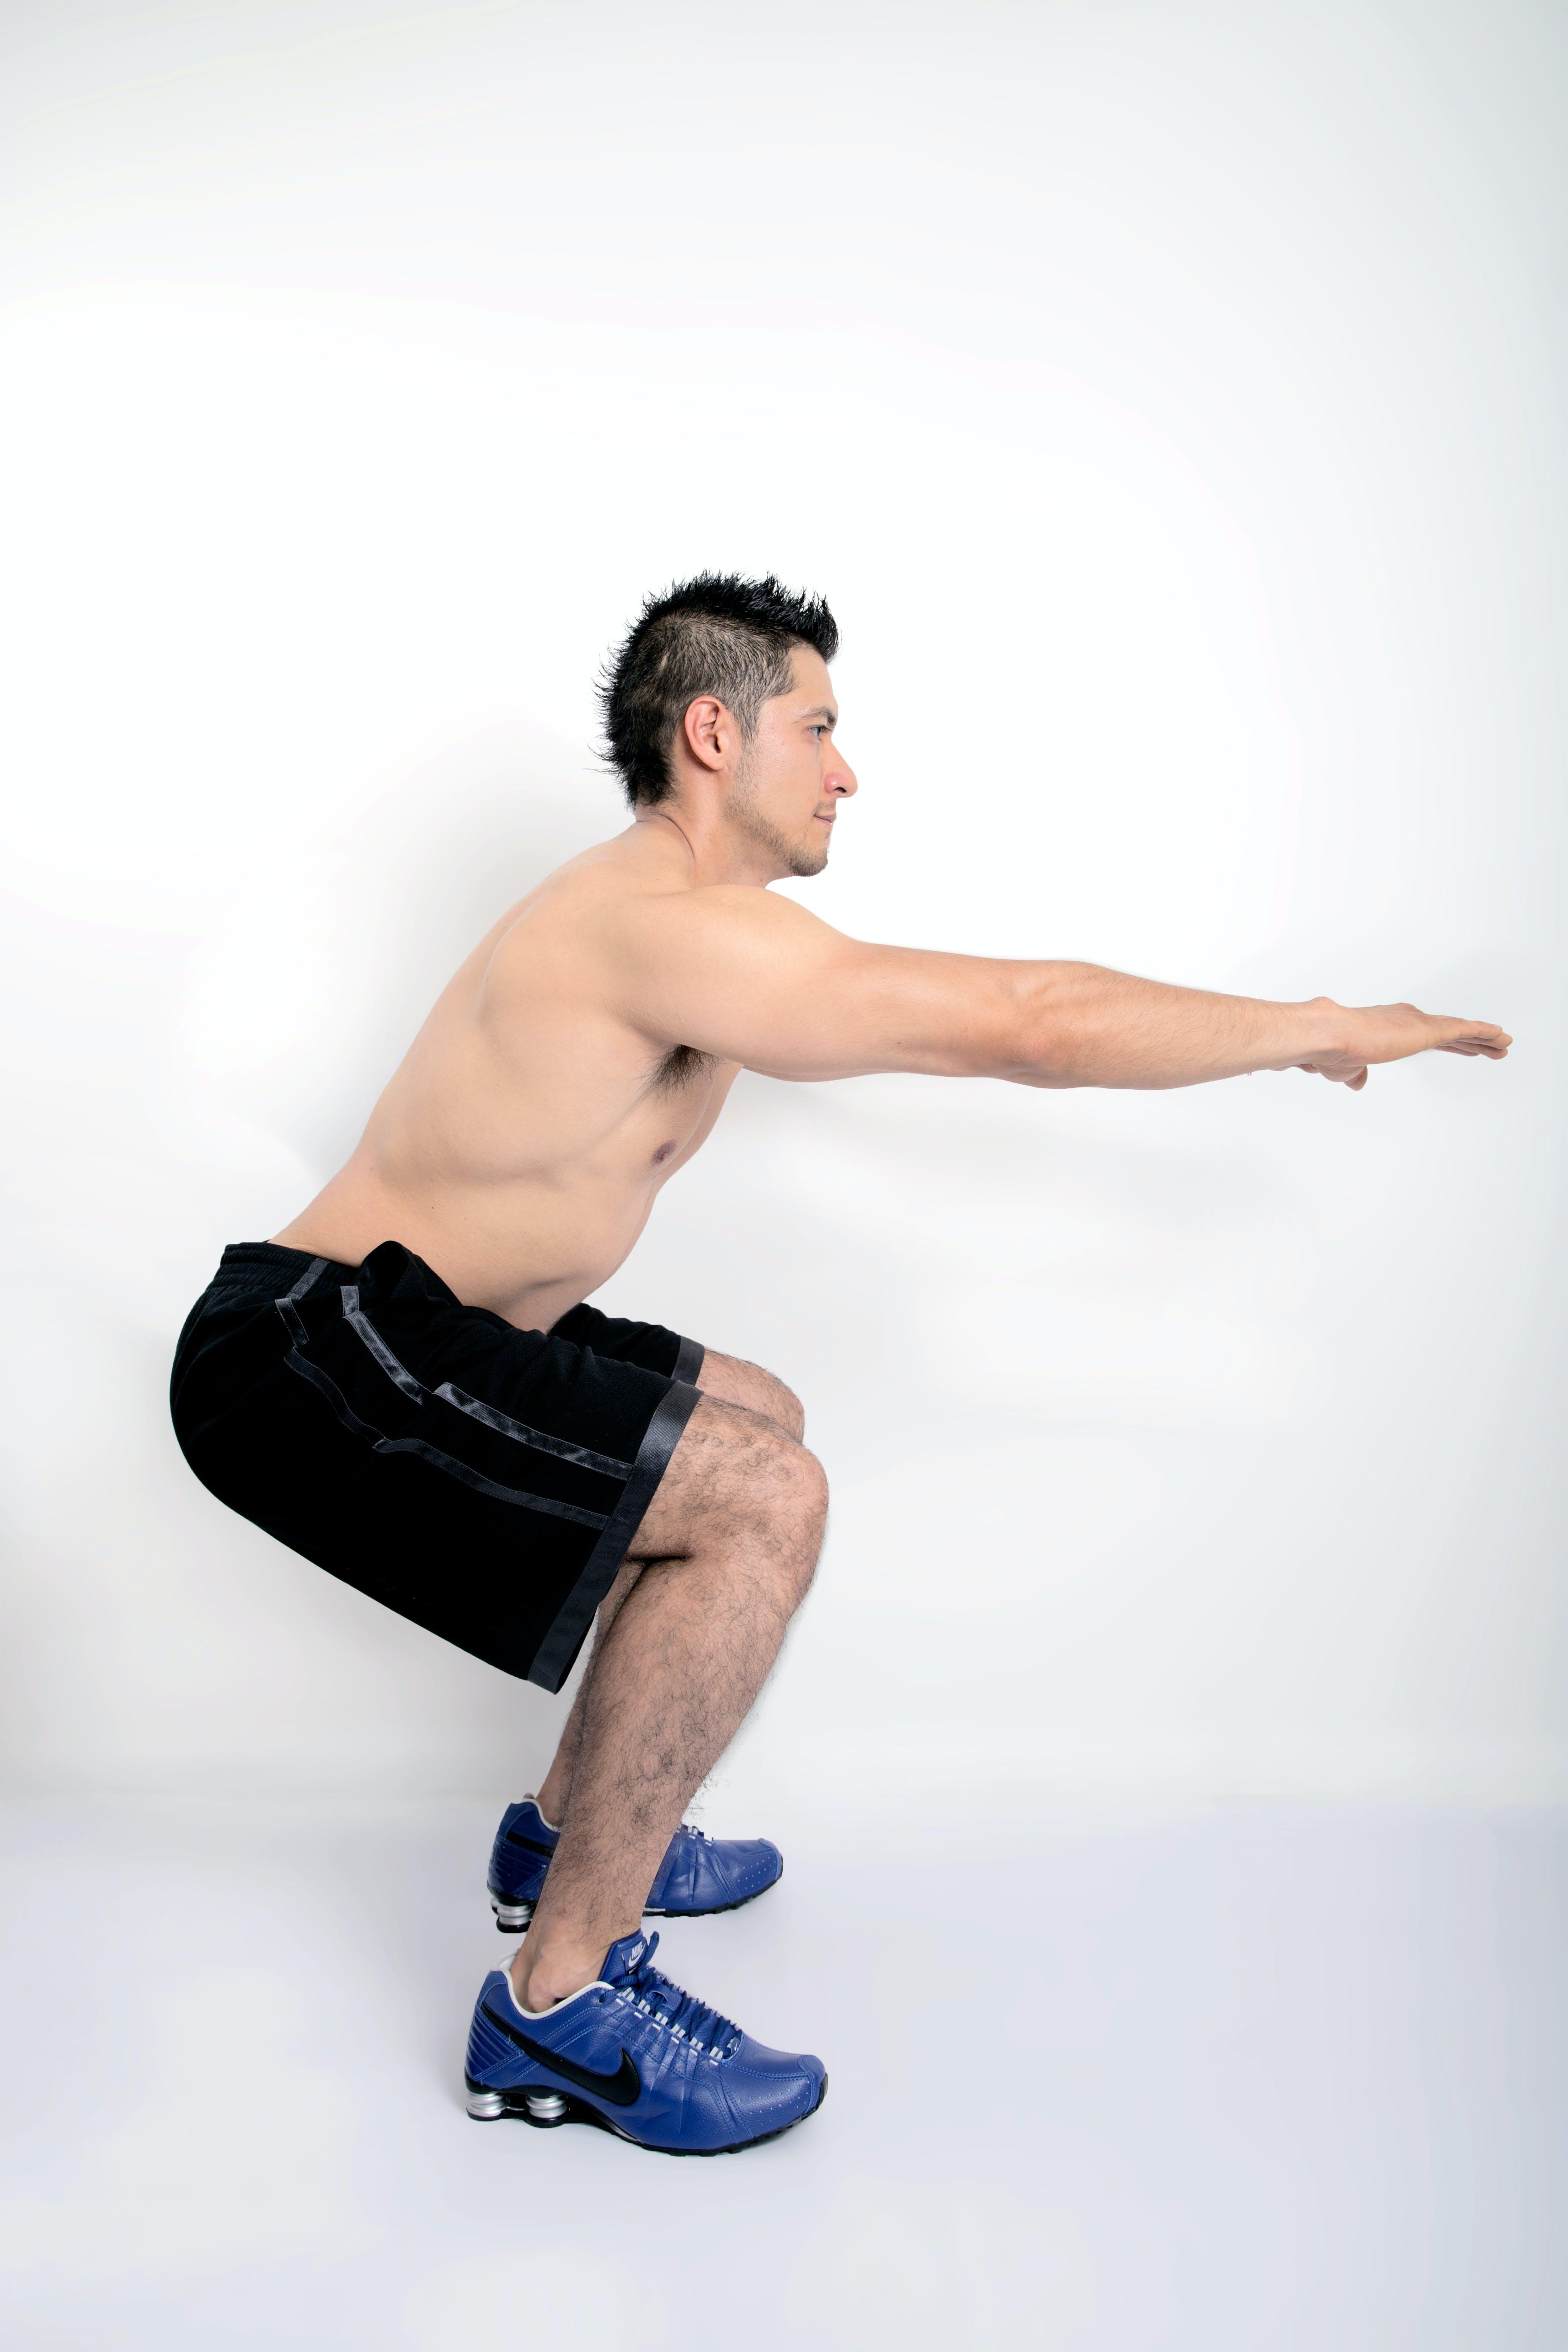 Kostenloses Stock Foto zu fitness, mann, model, ohne hemd